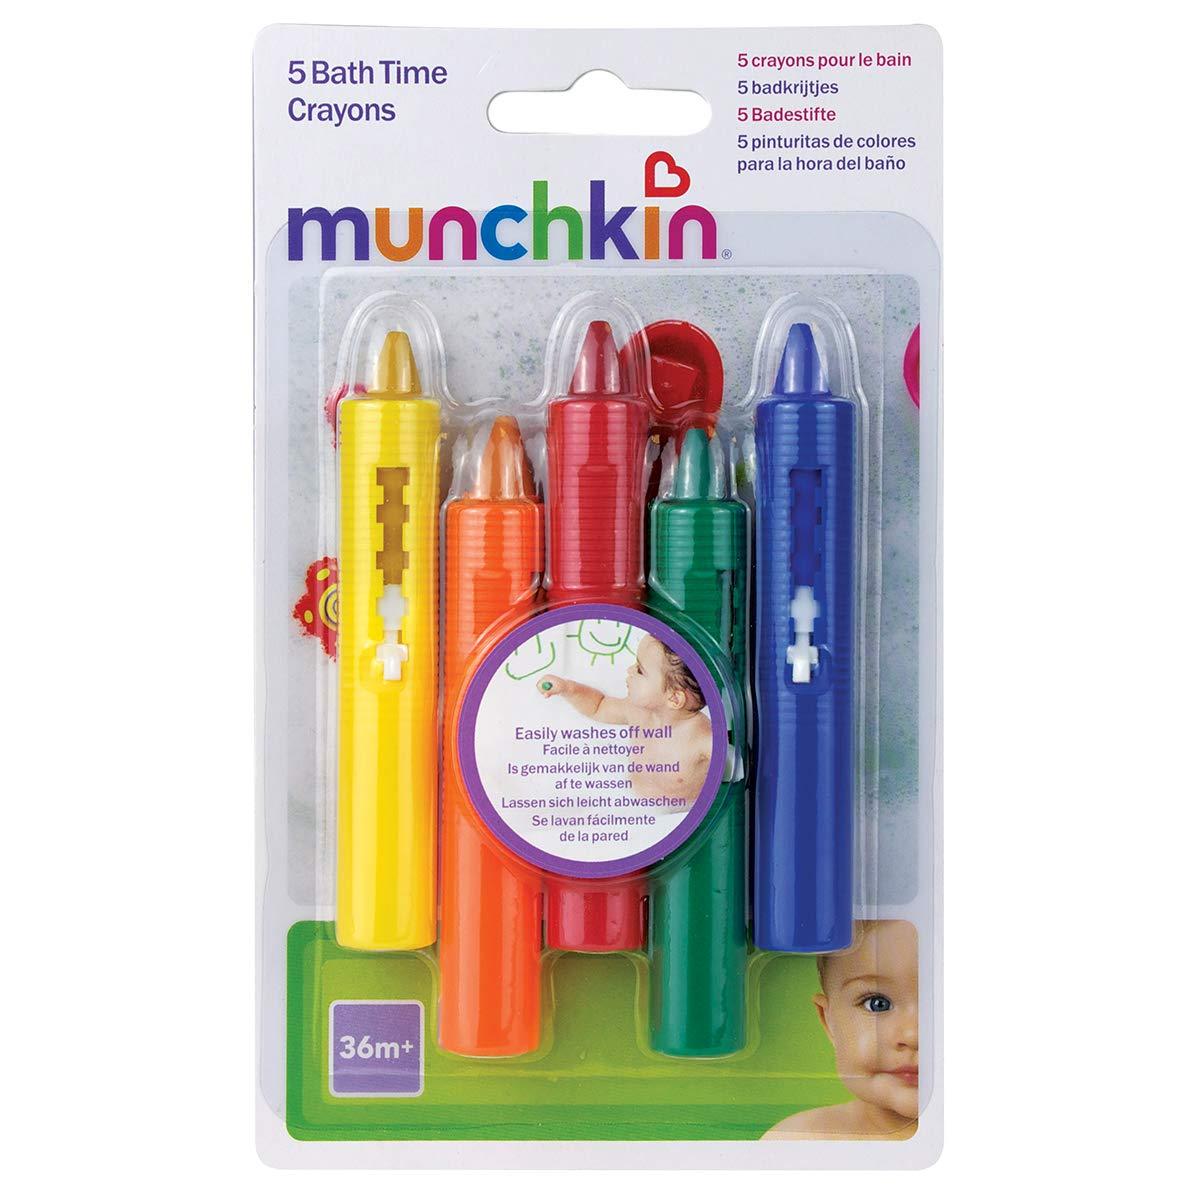 Munchkin 5 Crayons pour le Bain